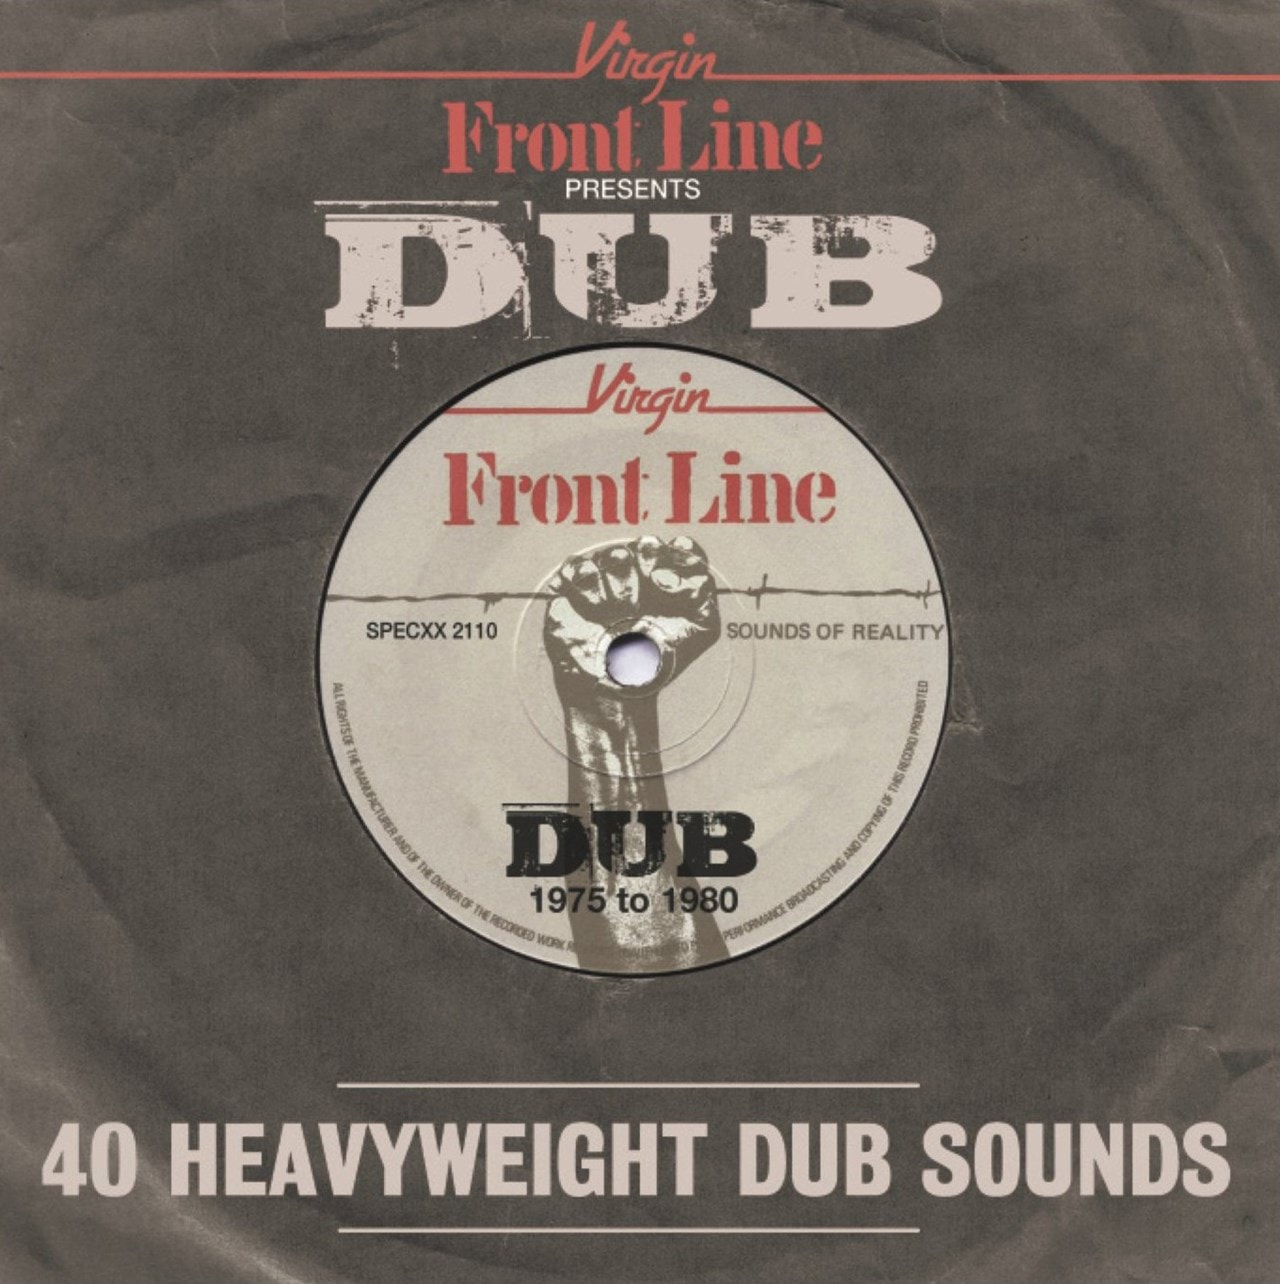 Front Line Presents Dub: 40 Heavyweight Dub Sounds - 1